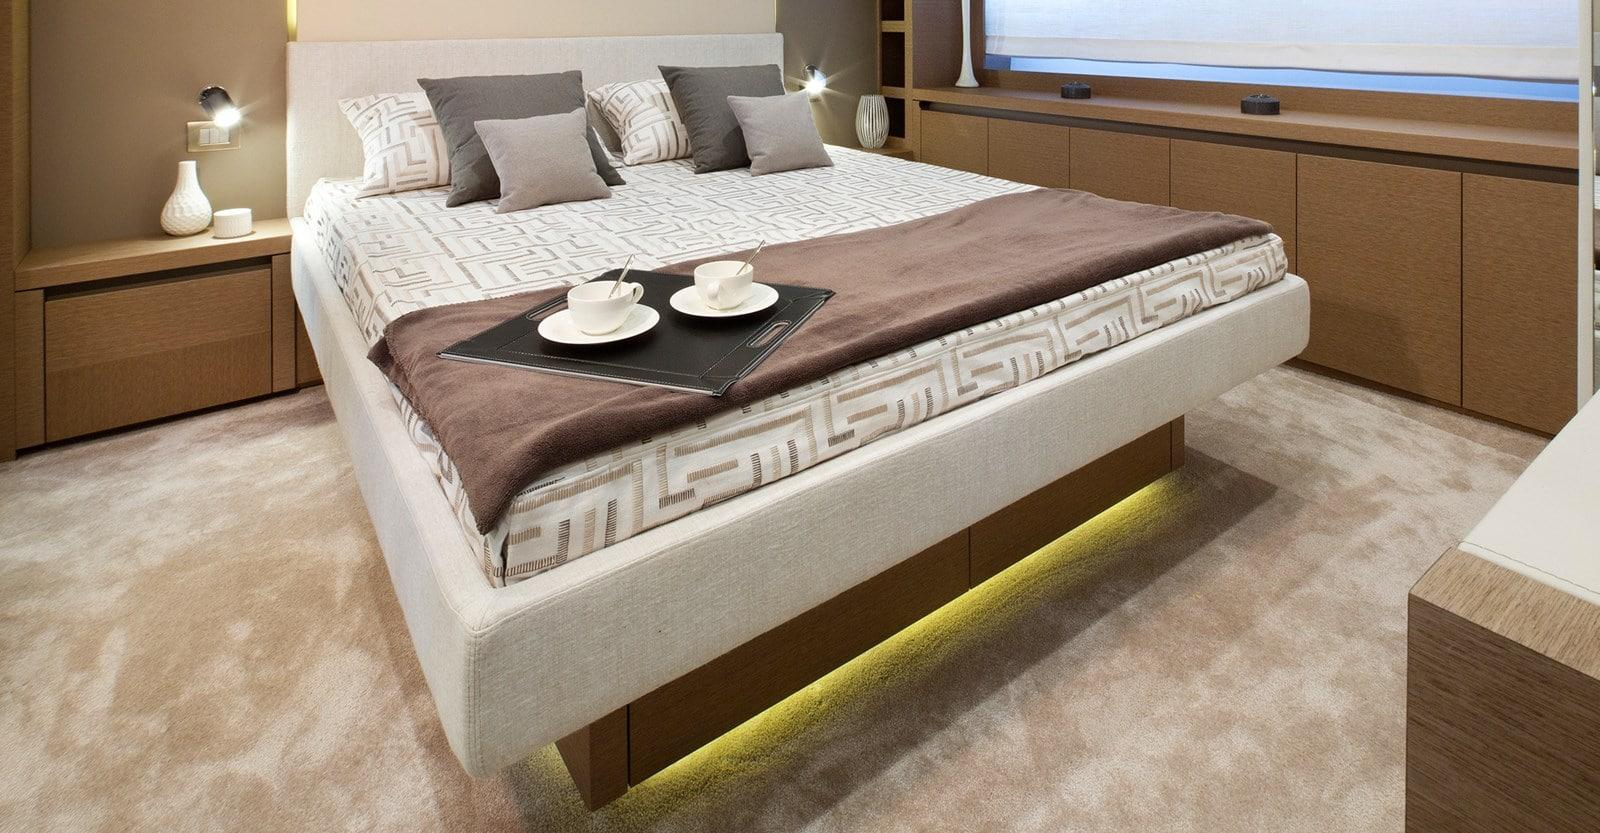 new prestige 750 yacht vip stateroom